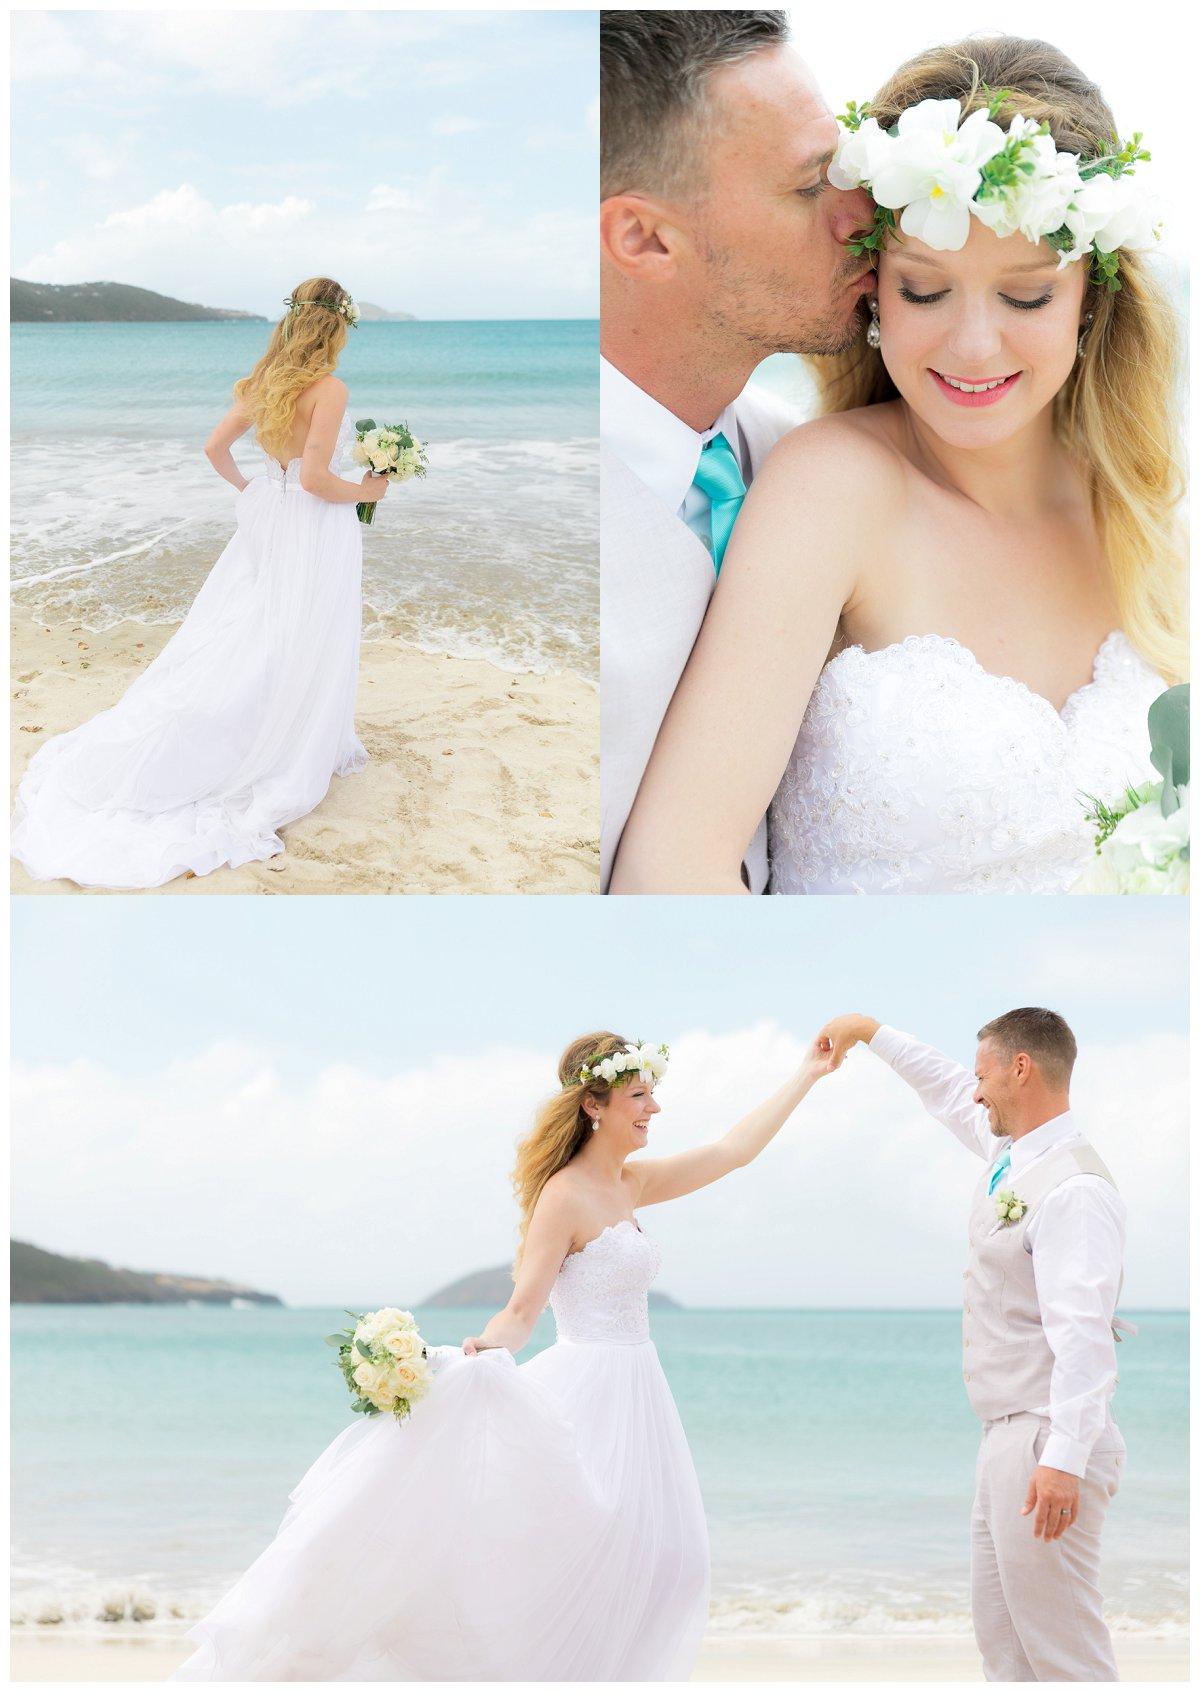 st-thomas-beach-wedding_0070.jpg